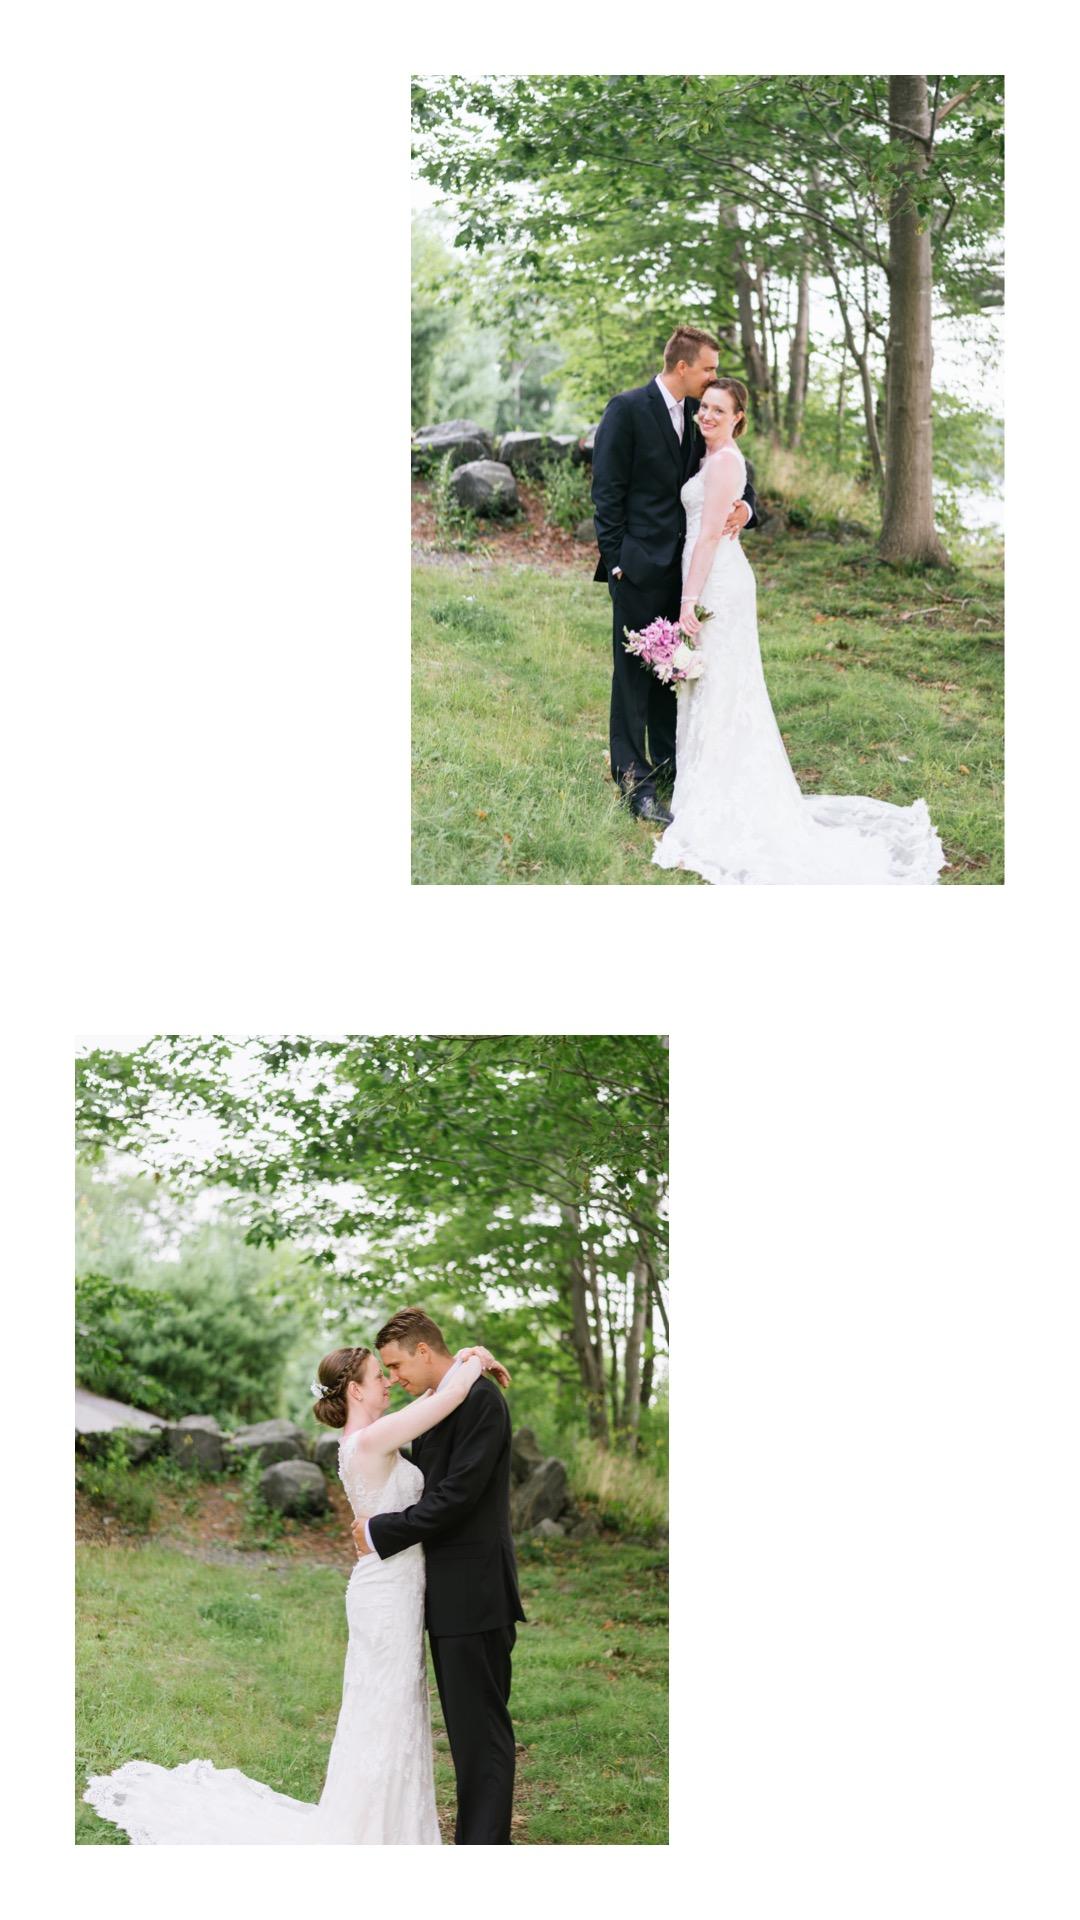 Martina & Scott Halifax Wedding Photographer - Sinead Dubeau Photography 17